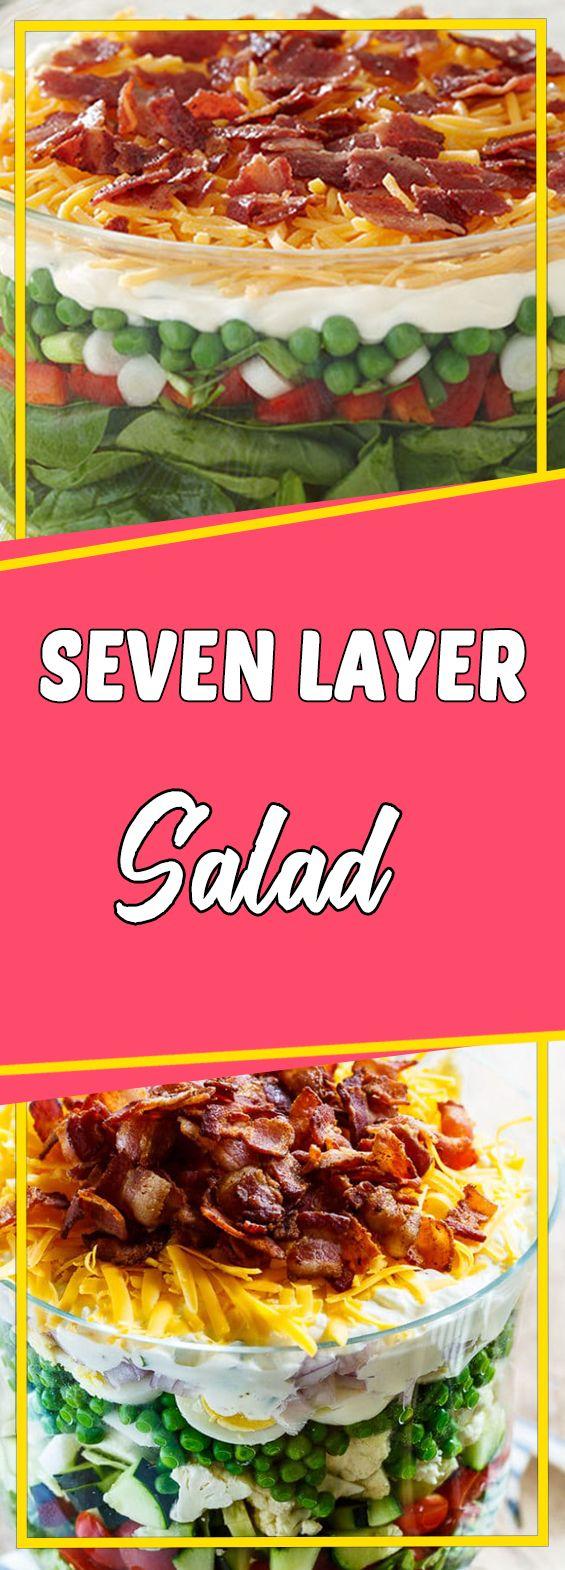 Seven Layer Salad #healthy #healthyeating #vegetarian #vegetarianrecipes #vegan #veganfood